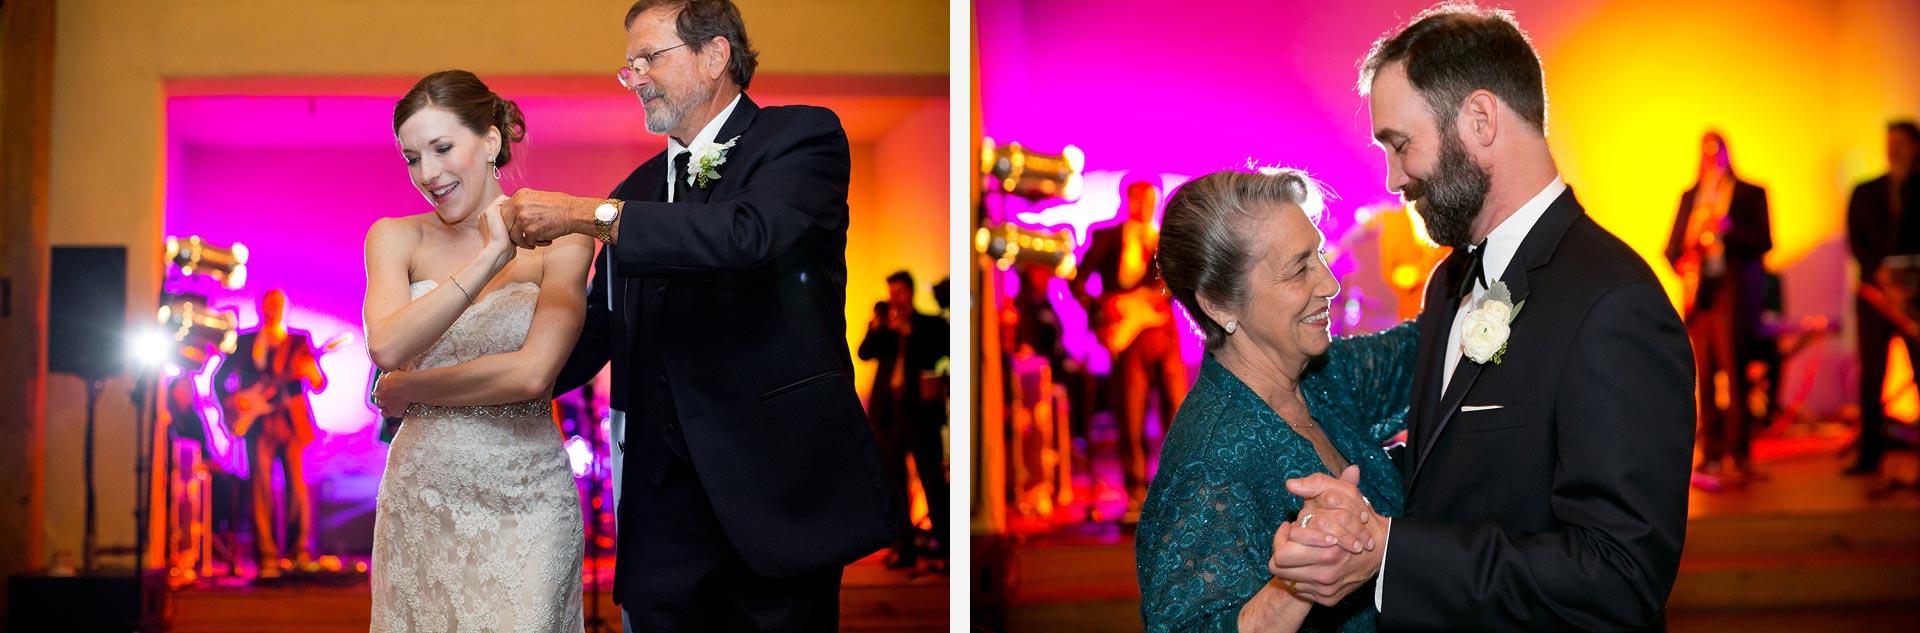 Barr Mansion Wedding Dance